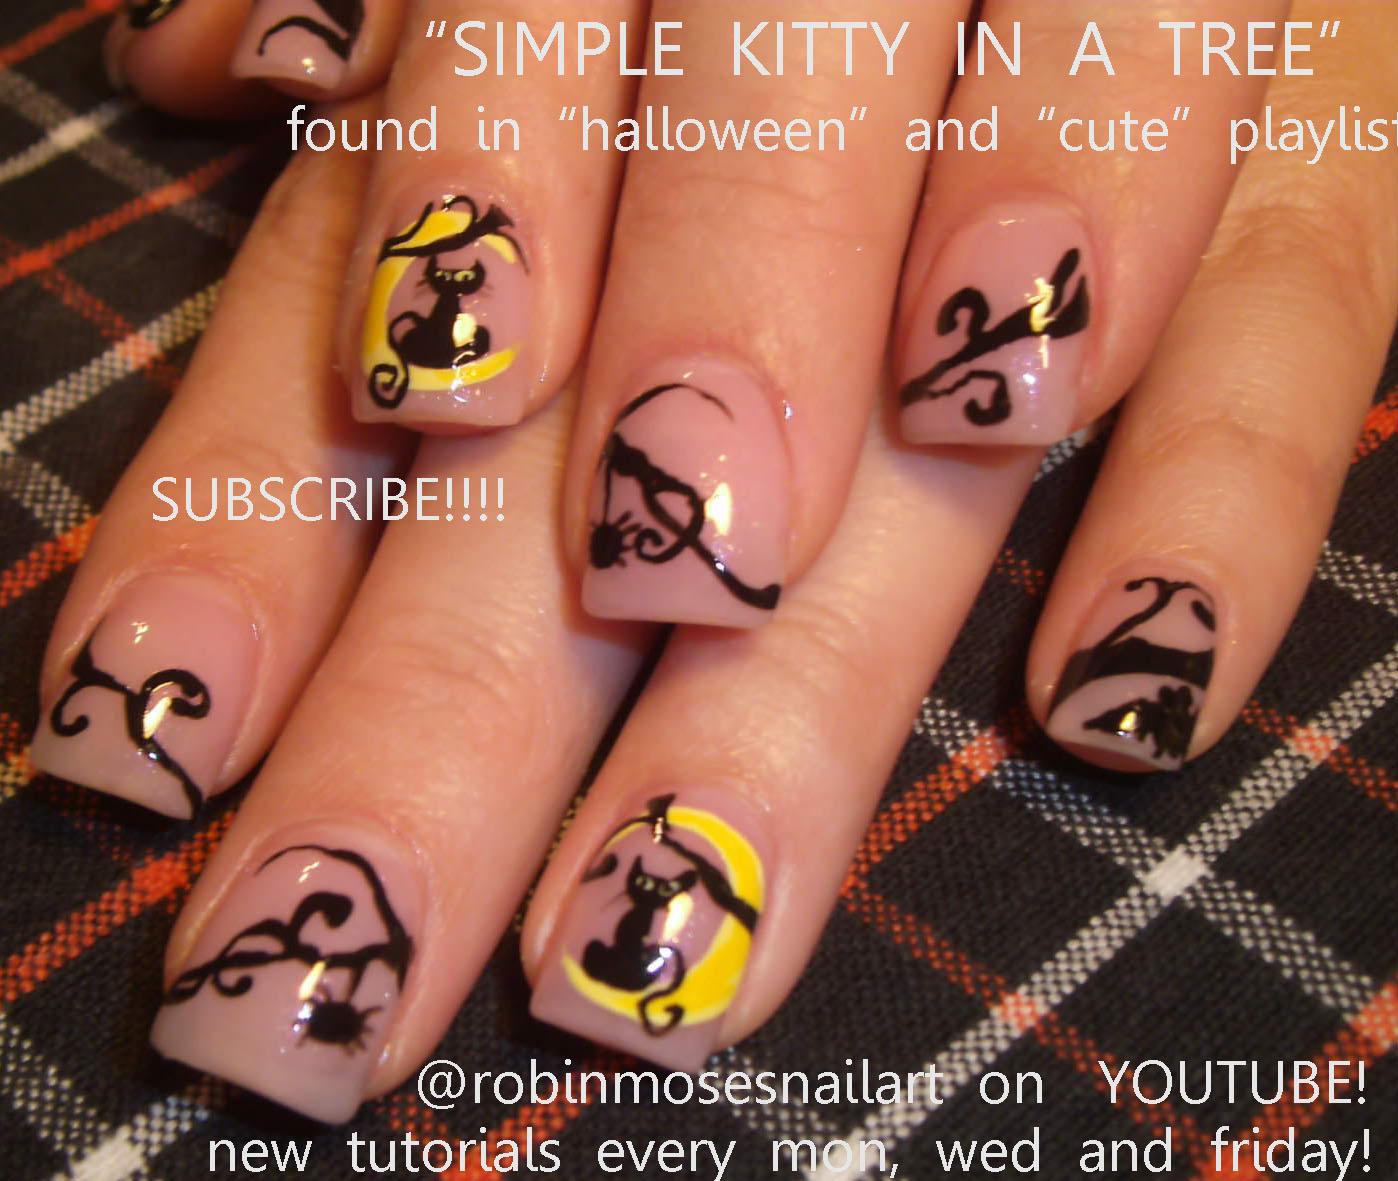 Robin moses nail art cute fall nail art cute fall nails fall simple cat sitting in a moon robin moses halloween nail art tutorial prinsesfo Images